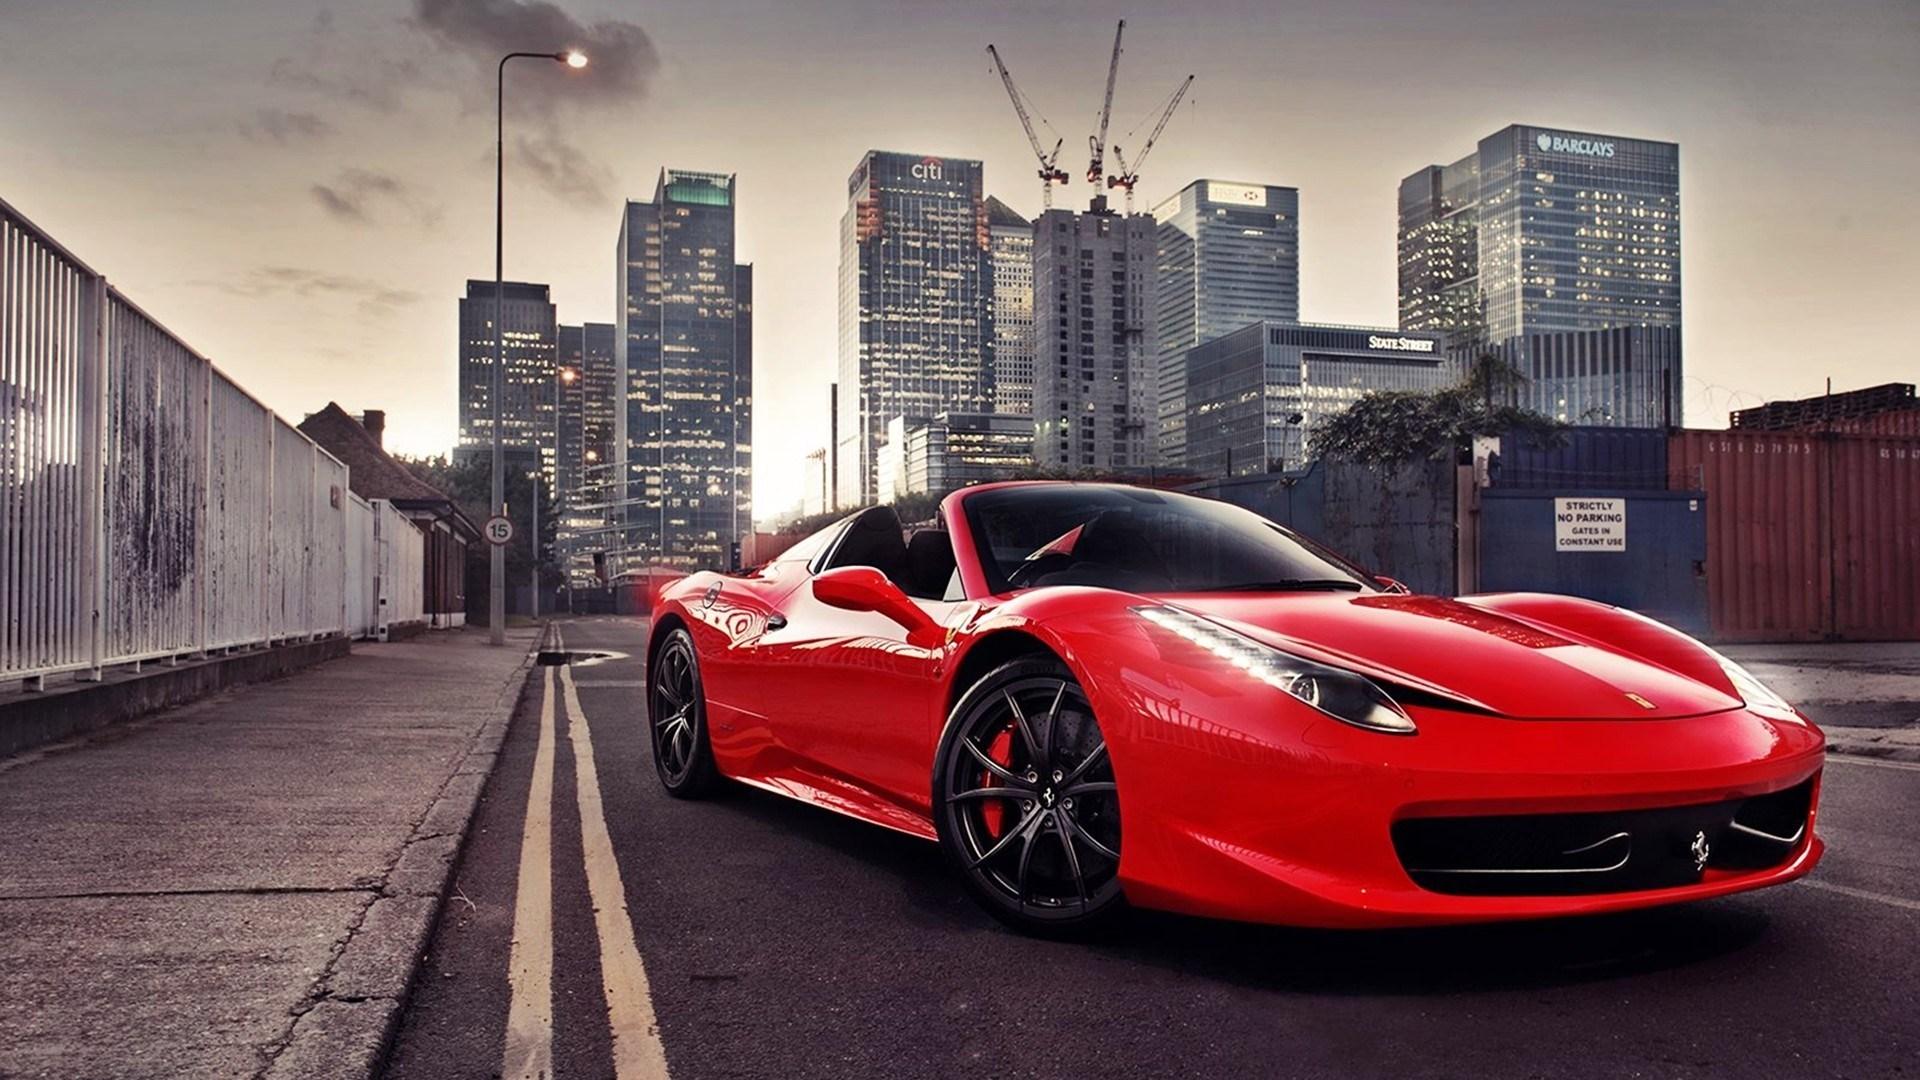 Red Ferrari 458 Italia Street Photo